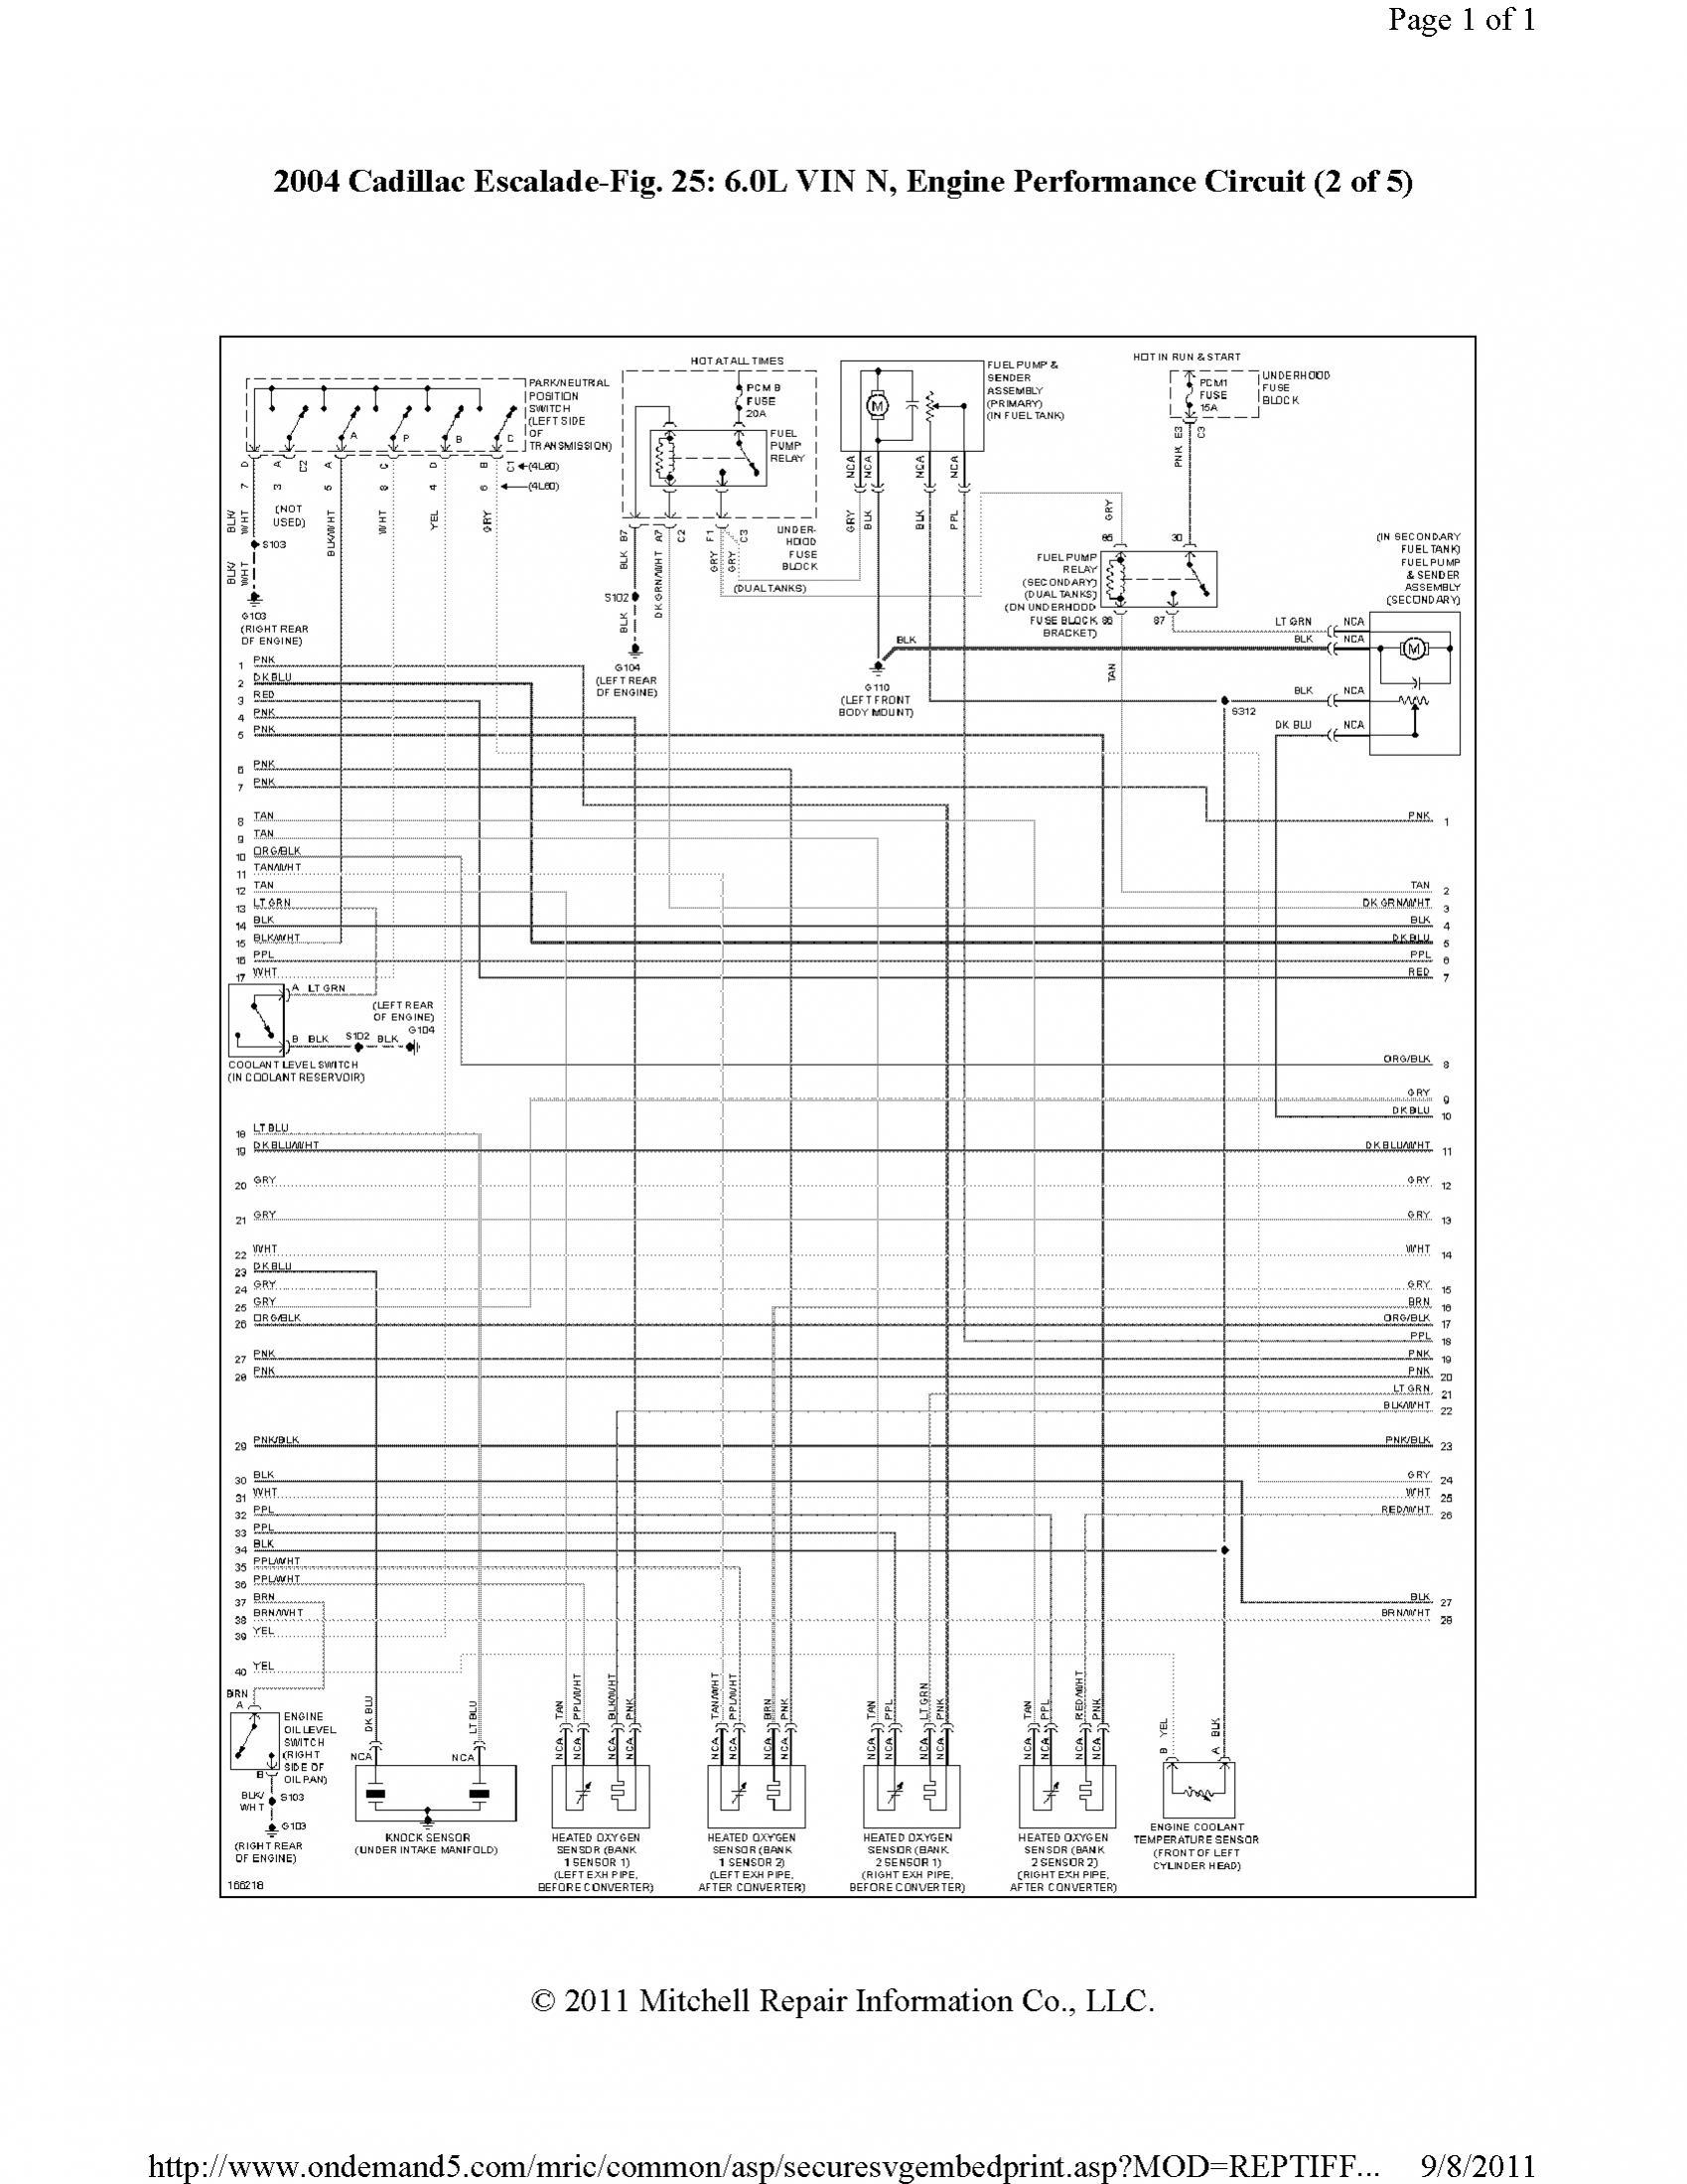 hight resolution of lq9 wiring diagram wiring diagram centre lq9 wiring harness diagram lq9 wiring diagram